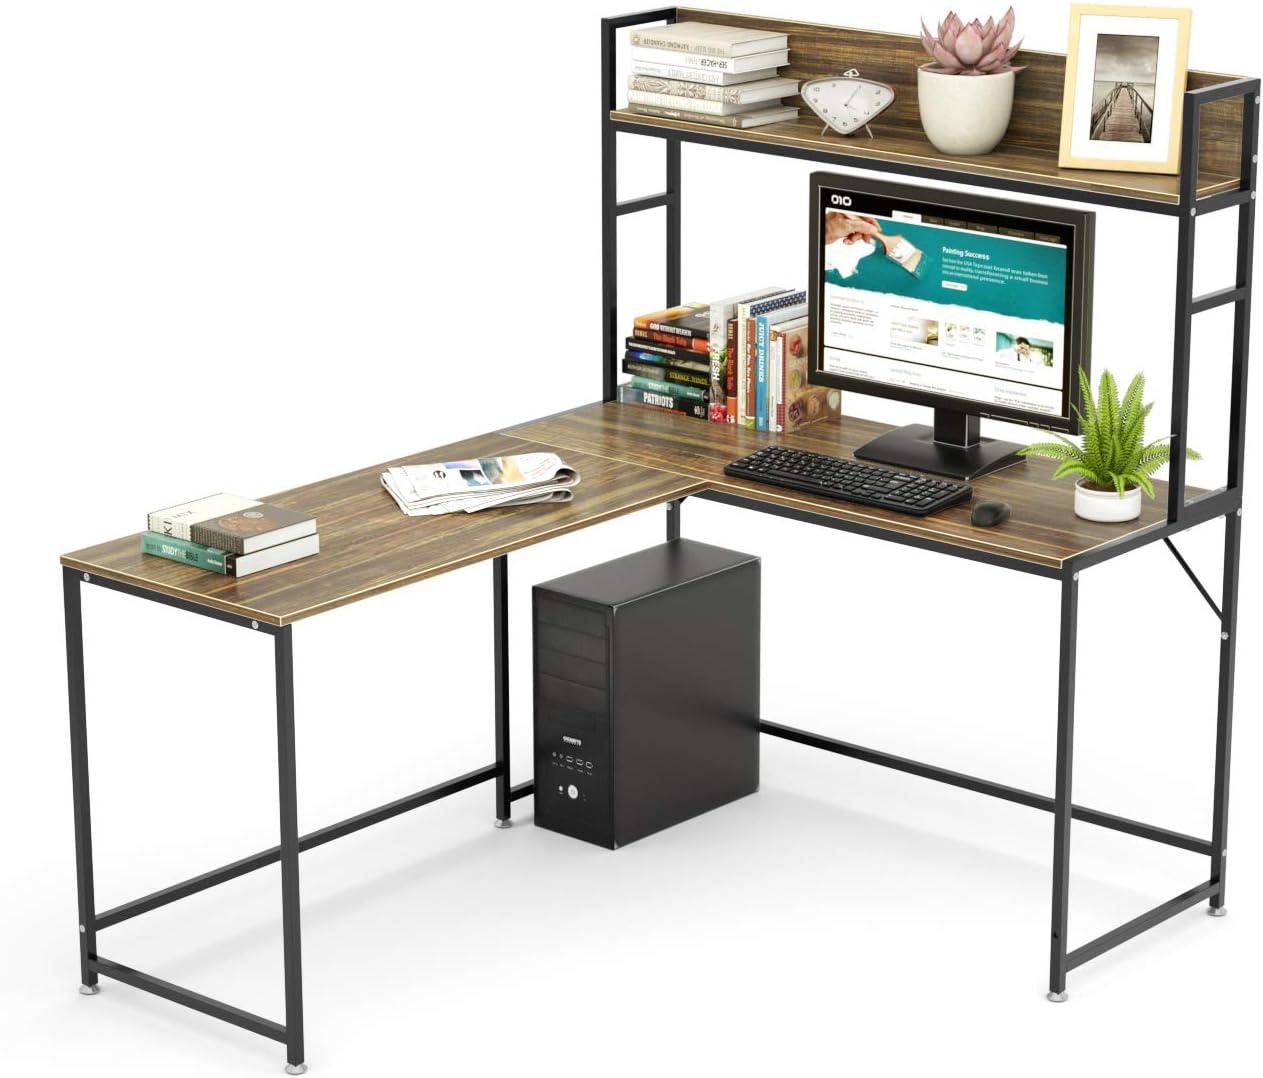 L-Shaped Computer Desk w// Storage Shelves Under Desk PC Workstation Laptop Table